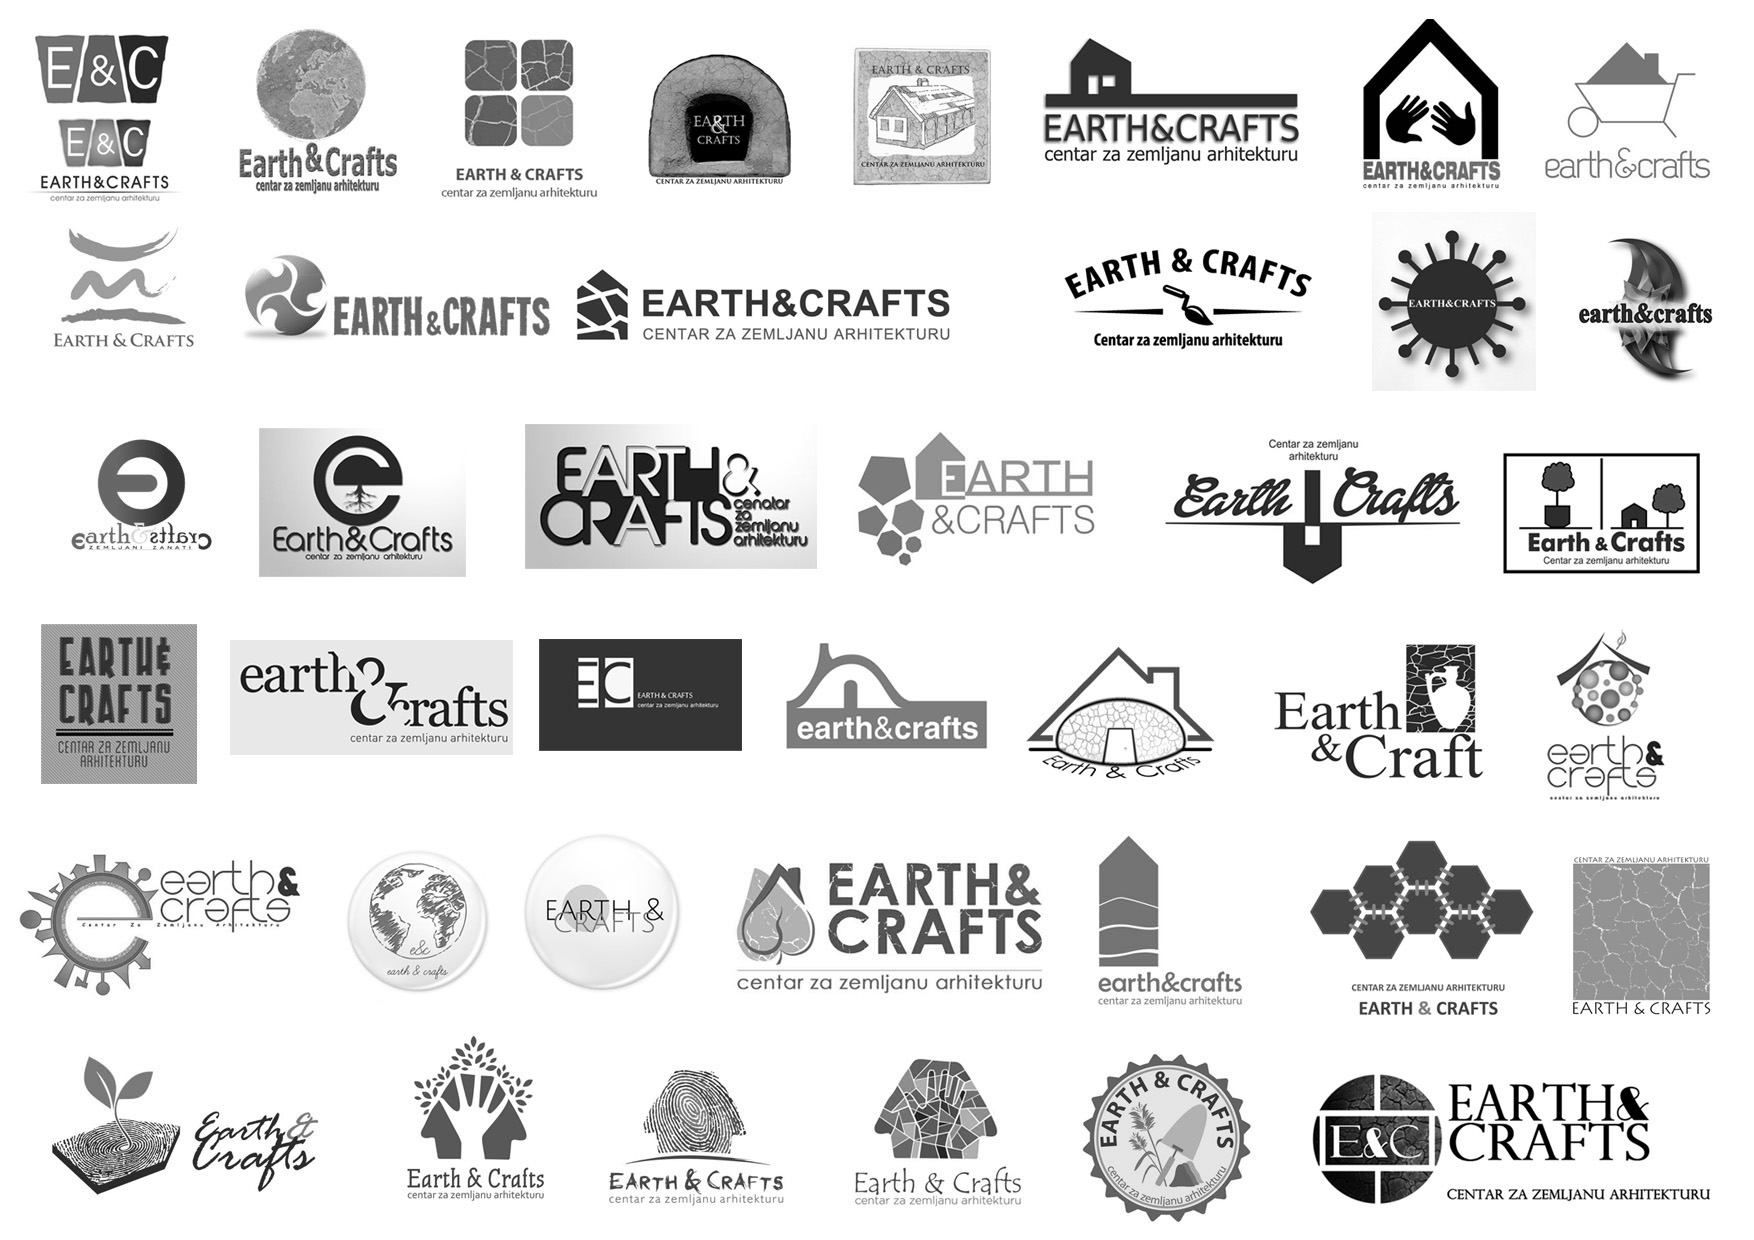 00-40 logo EARTH&CRAFTS predlozi b&w